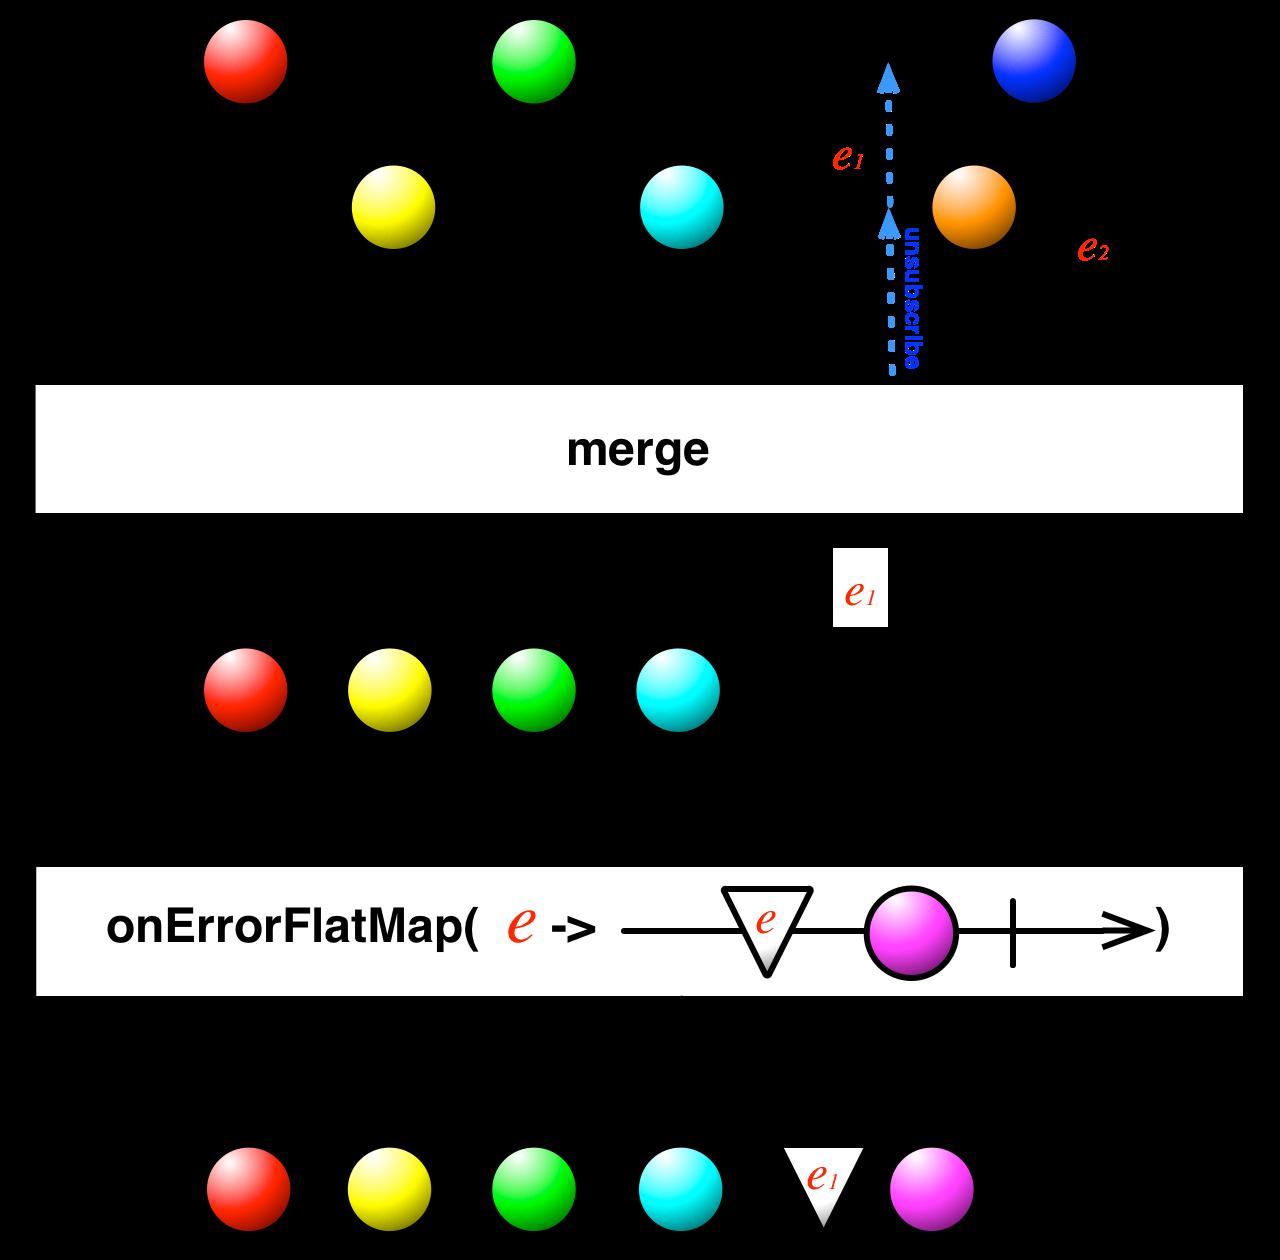 unintuitive onErrorFlatMap and Merge interaction